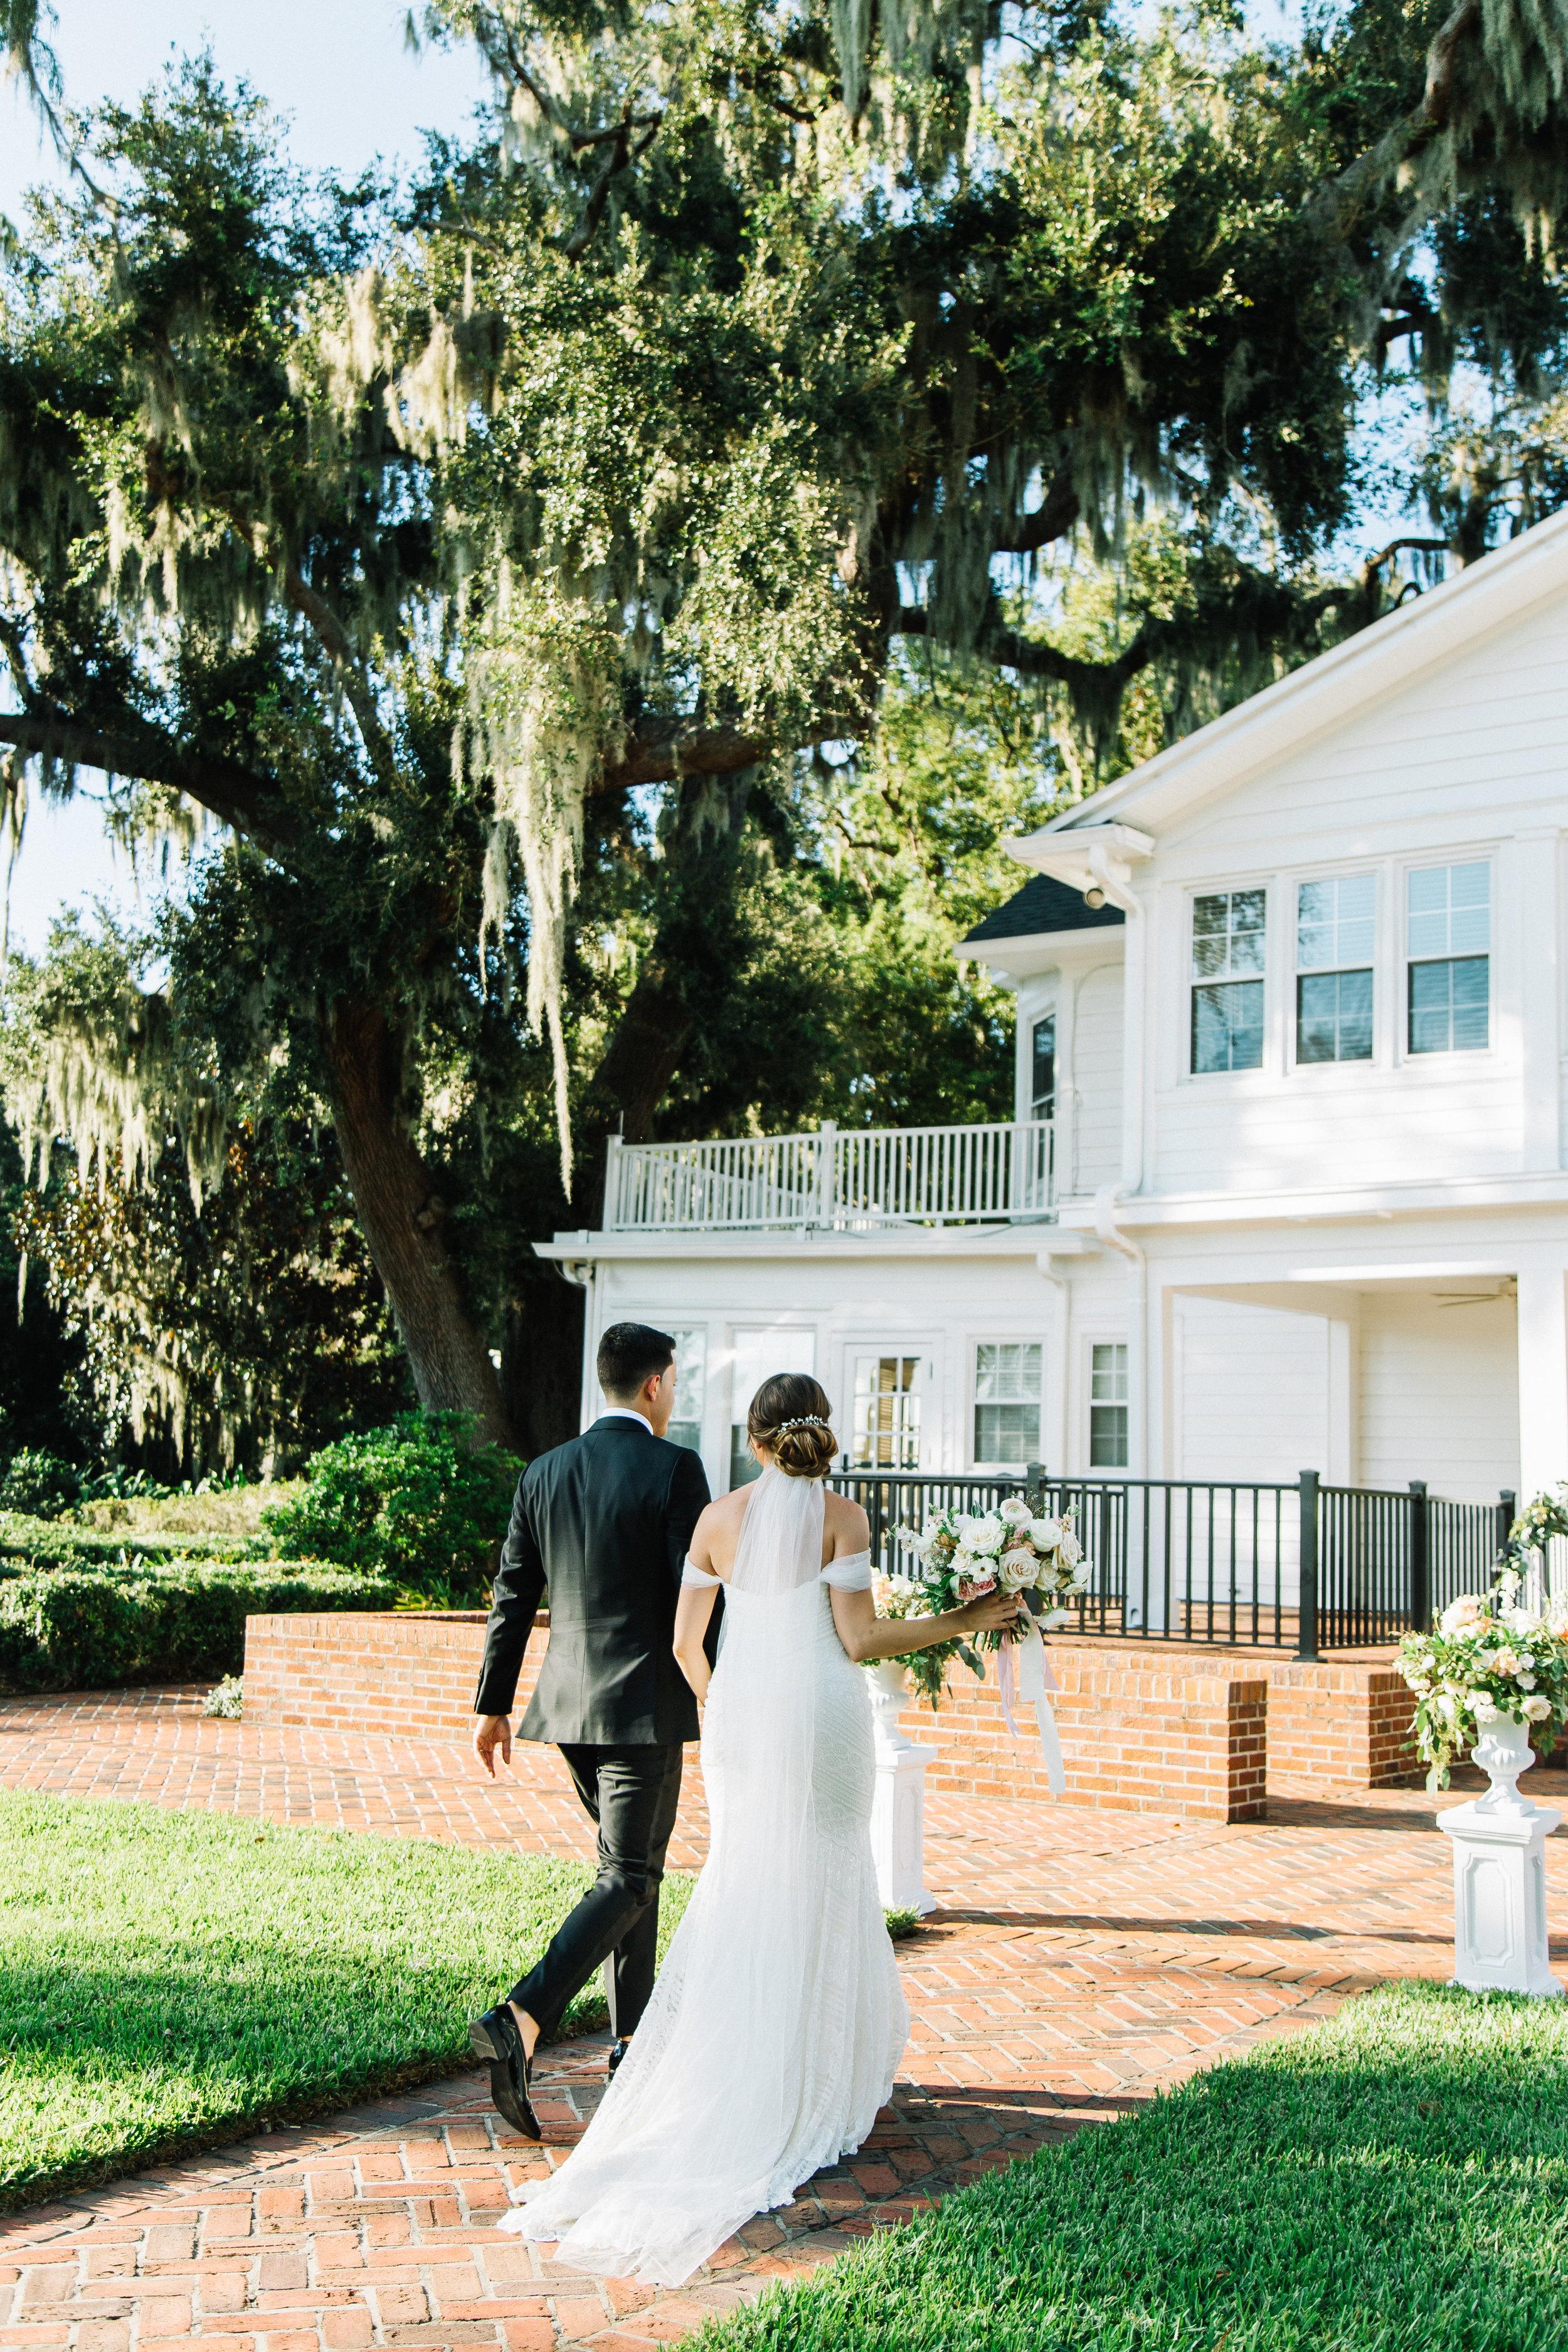 Mike_Alexis_Cypress_Grove_Estate_Wedding-364.jpg